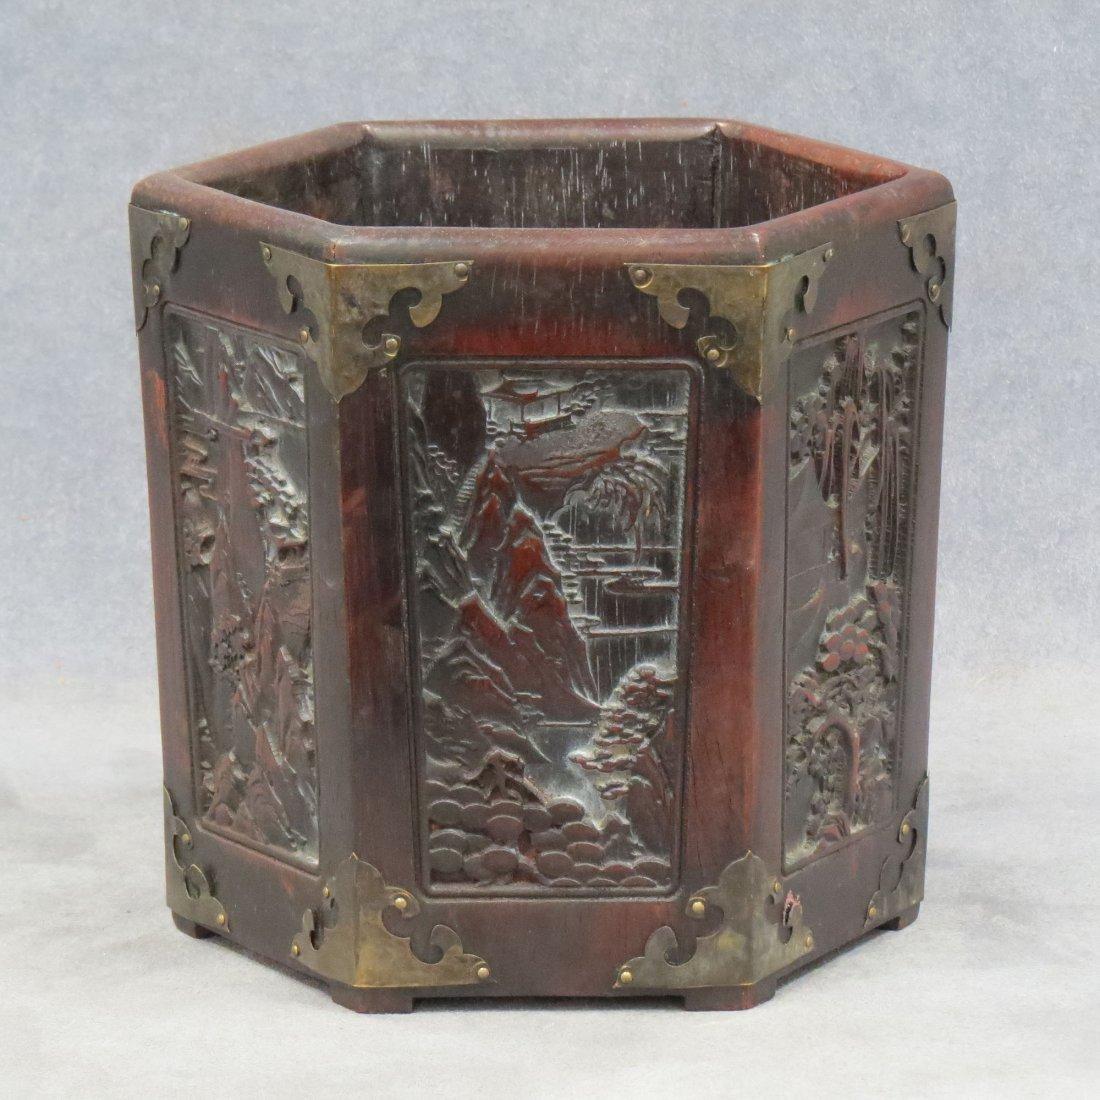 CHINESE HARDWOOD HEXAGONAL PANELED BRUSH POT